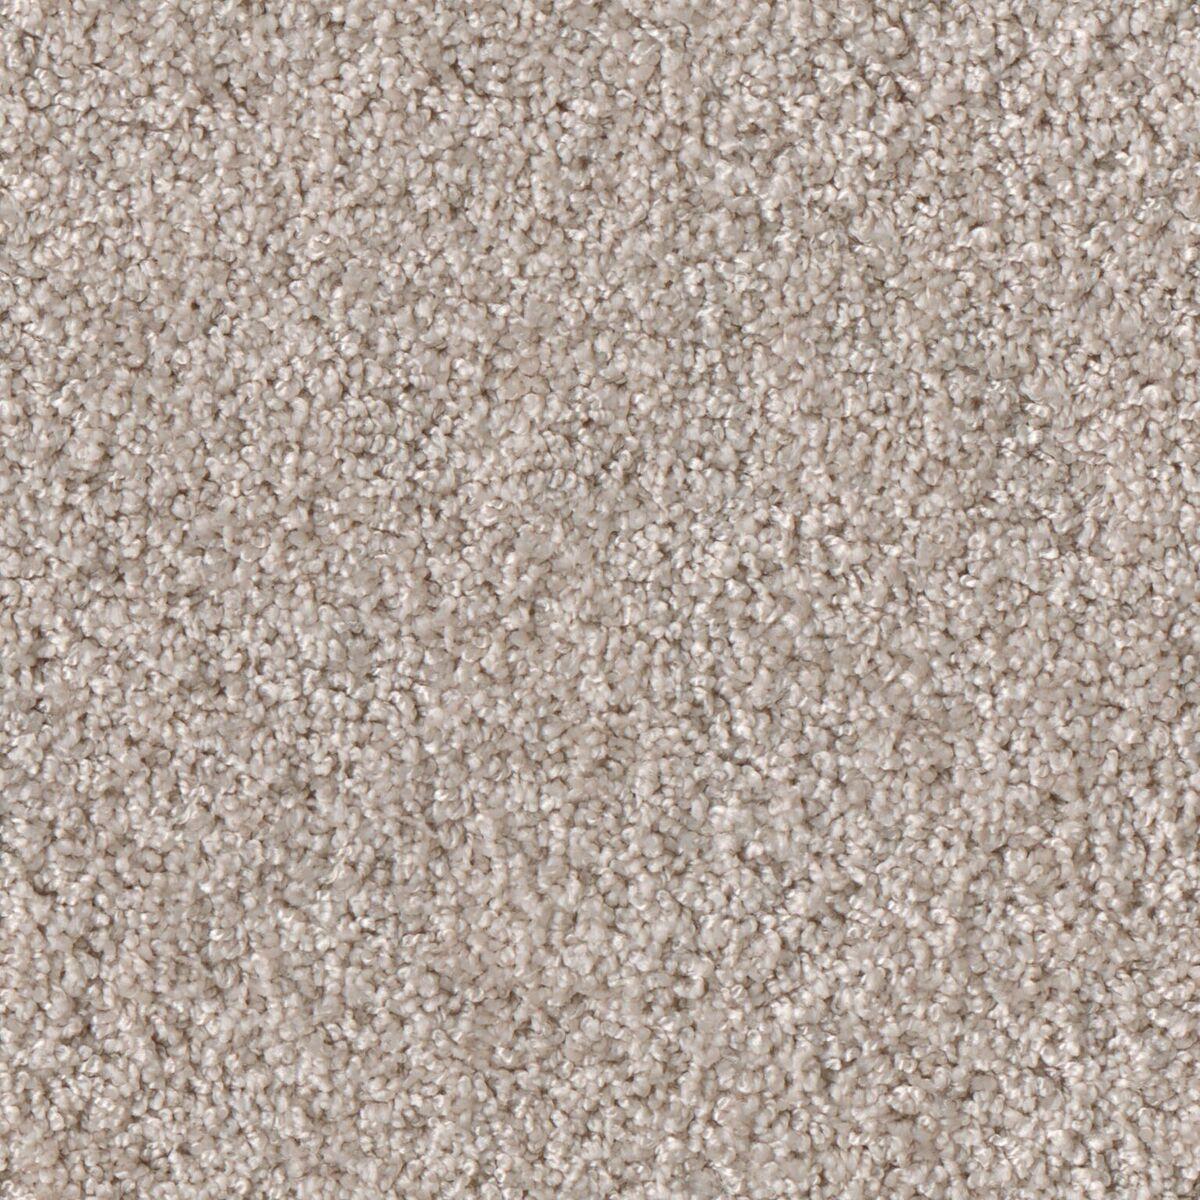 Smoozy - 1602 creme